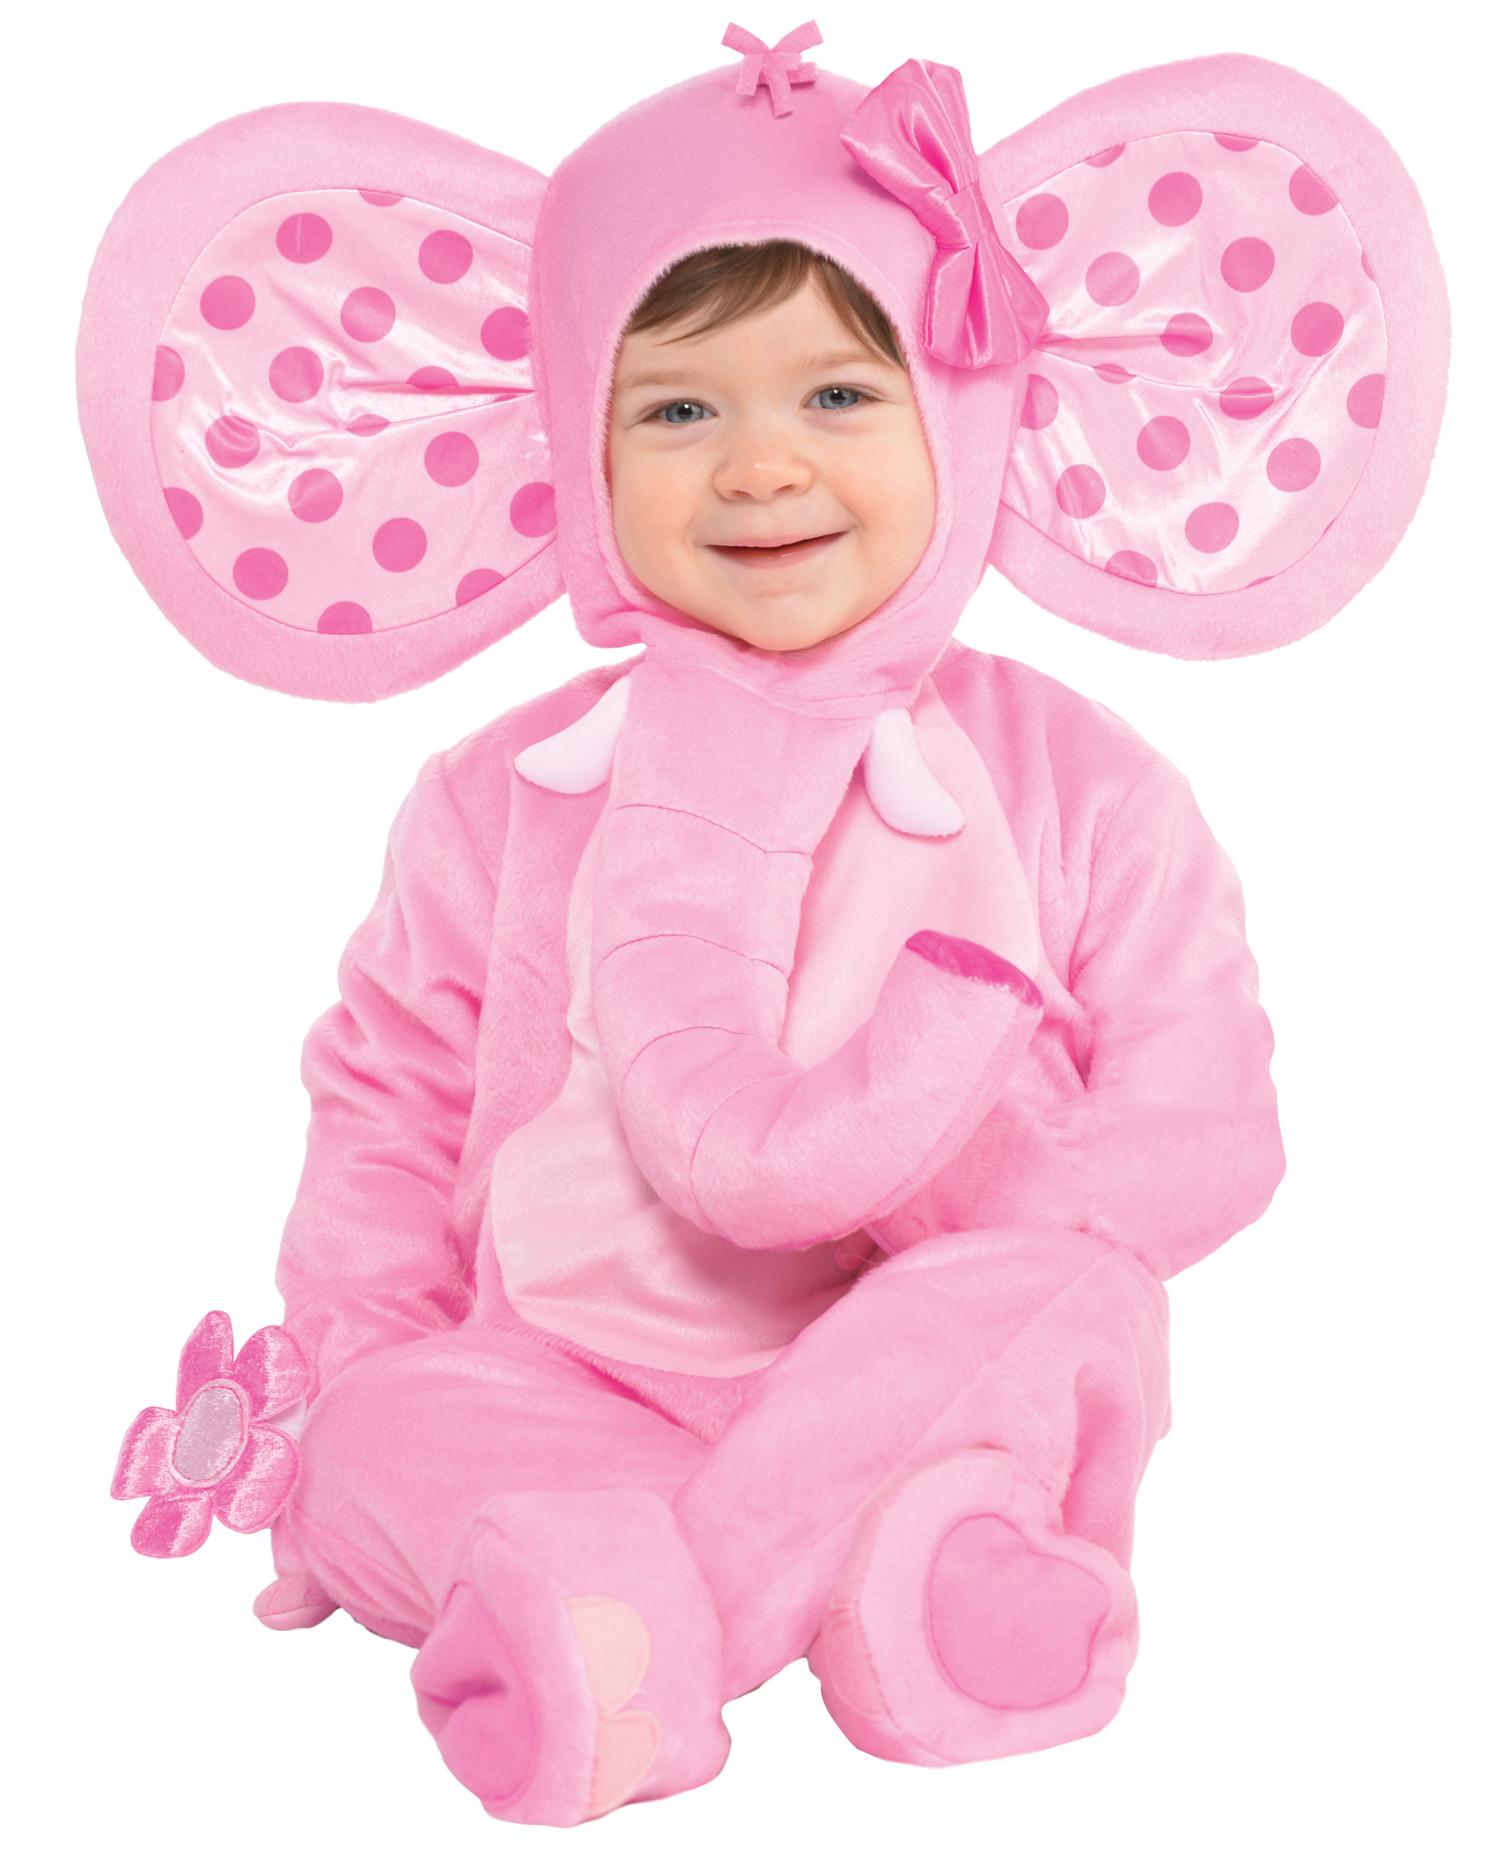 Animal Toddler Fancy Dress Wild Safari Zoo Infants Baby Costume 0 24